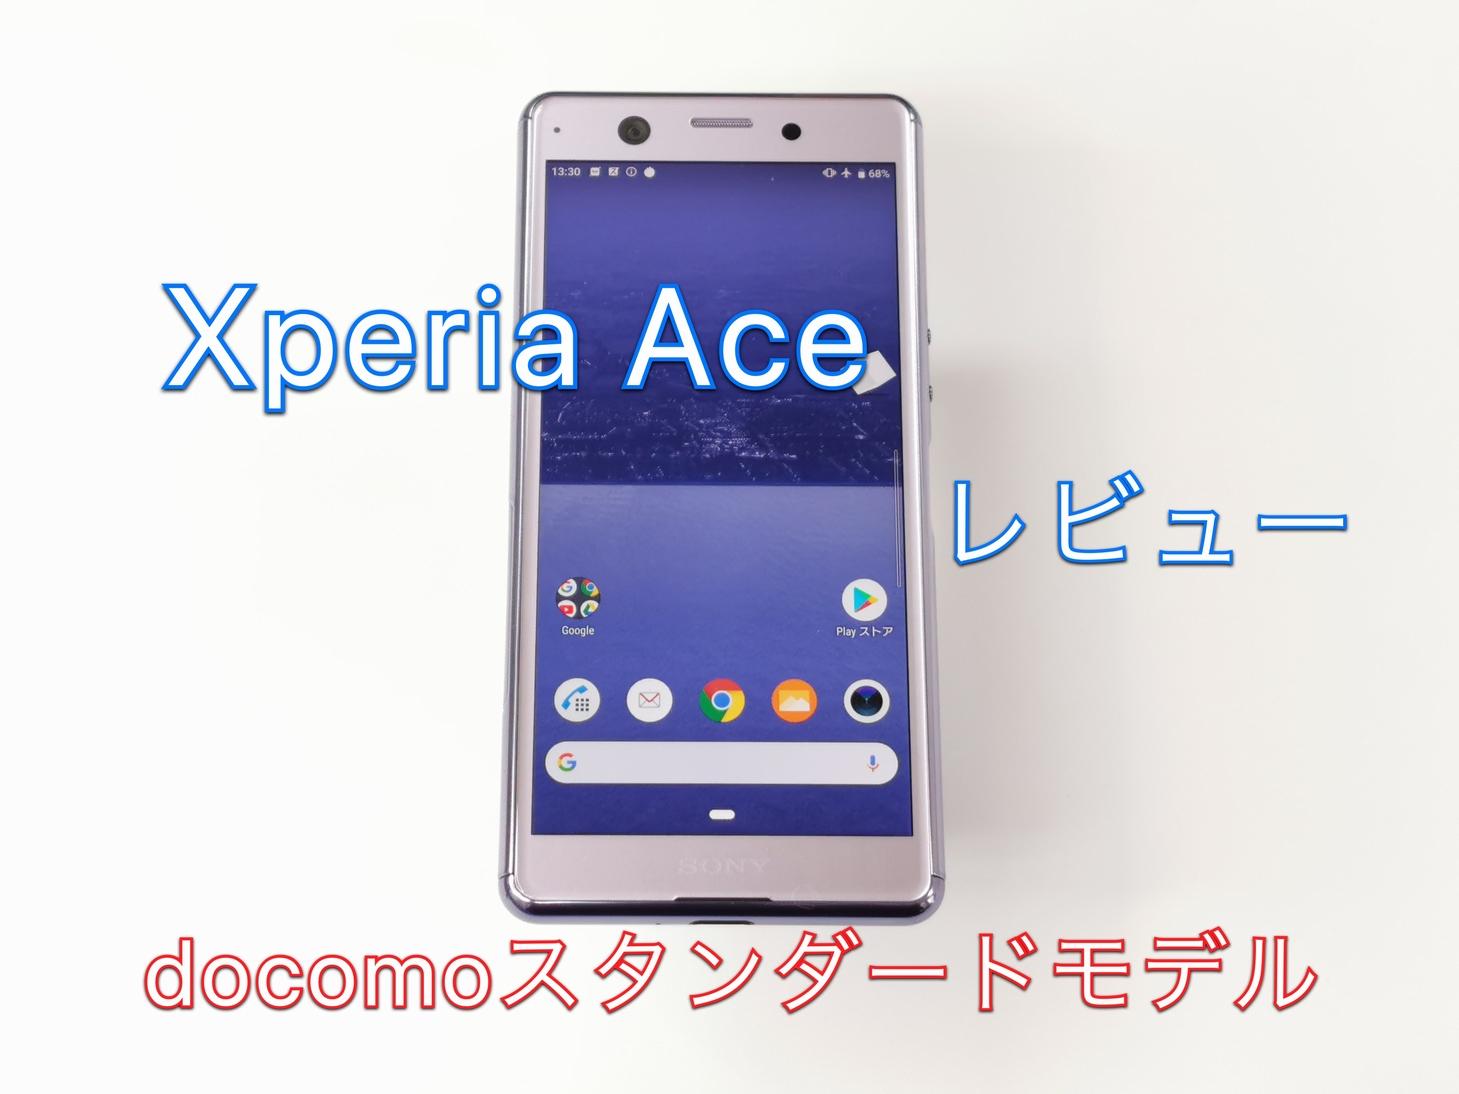 Xperia Ace SO-02L レビュー 気持ちよく使える持ちやすさだが比較した時のコストパフォーマンスは劣りがち【ドコモ/楽天モバイル】